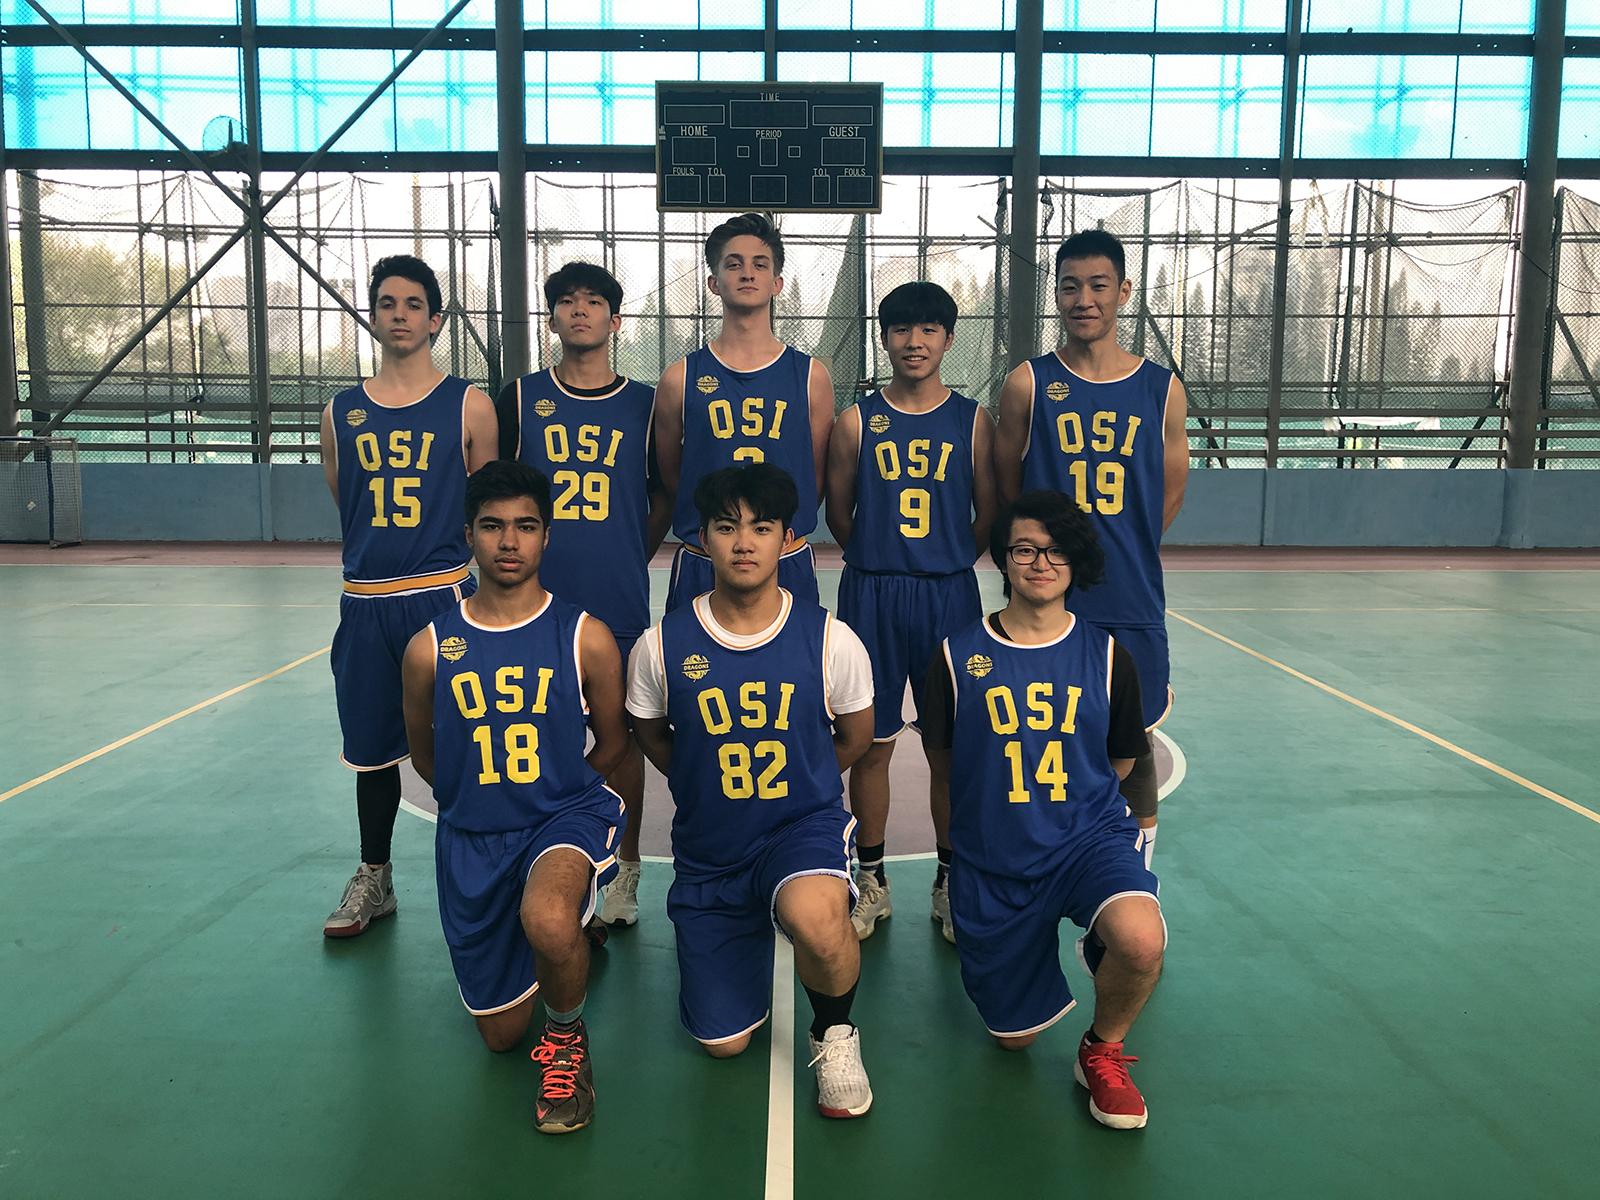 QSI International School of Shenzen - Boys